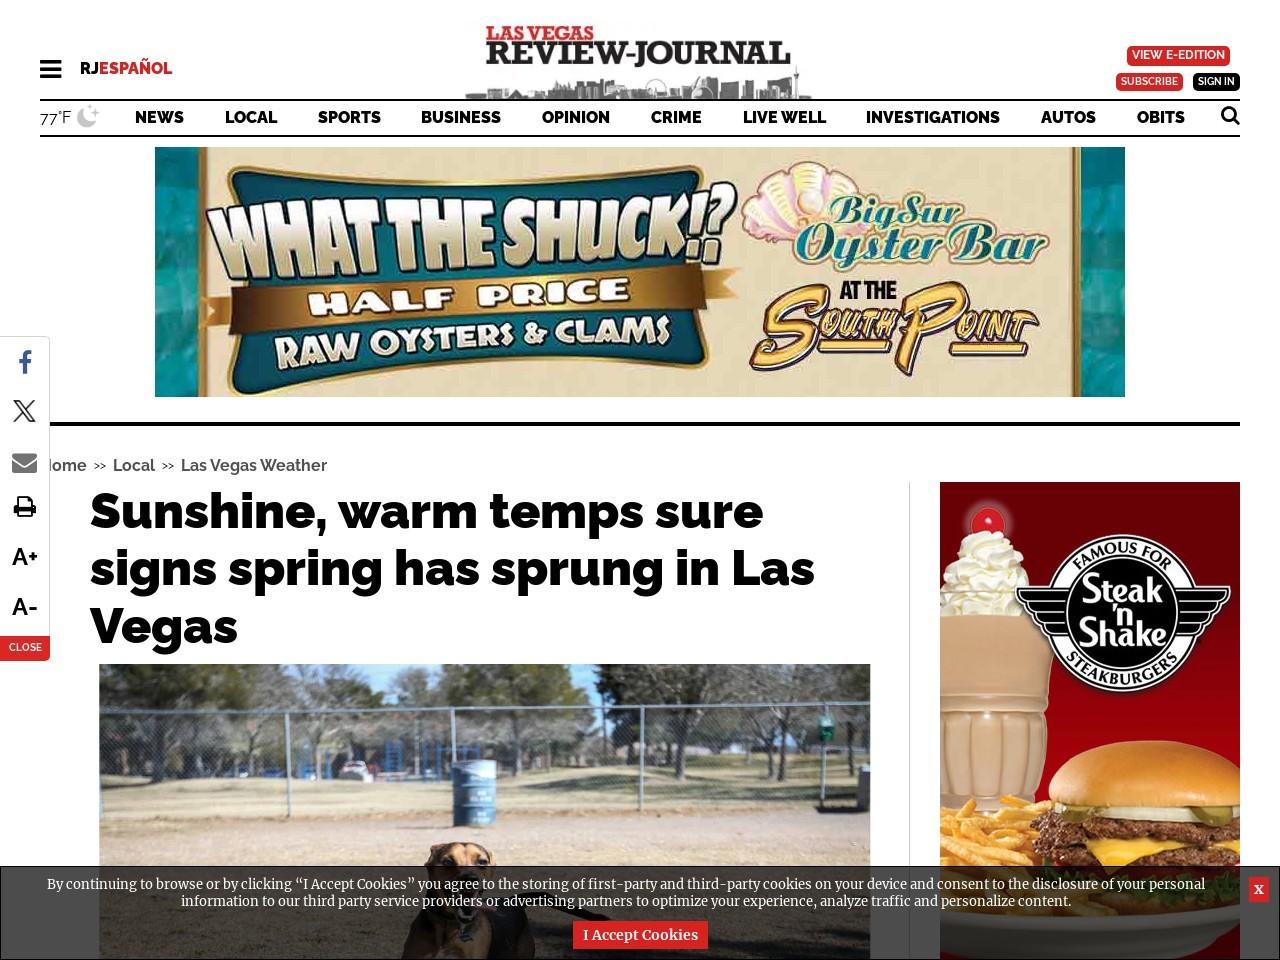 Sunshine, warm temps sure signs spring has sprung in Las Vegas